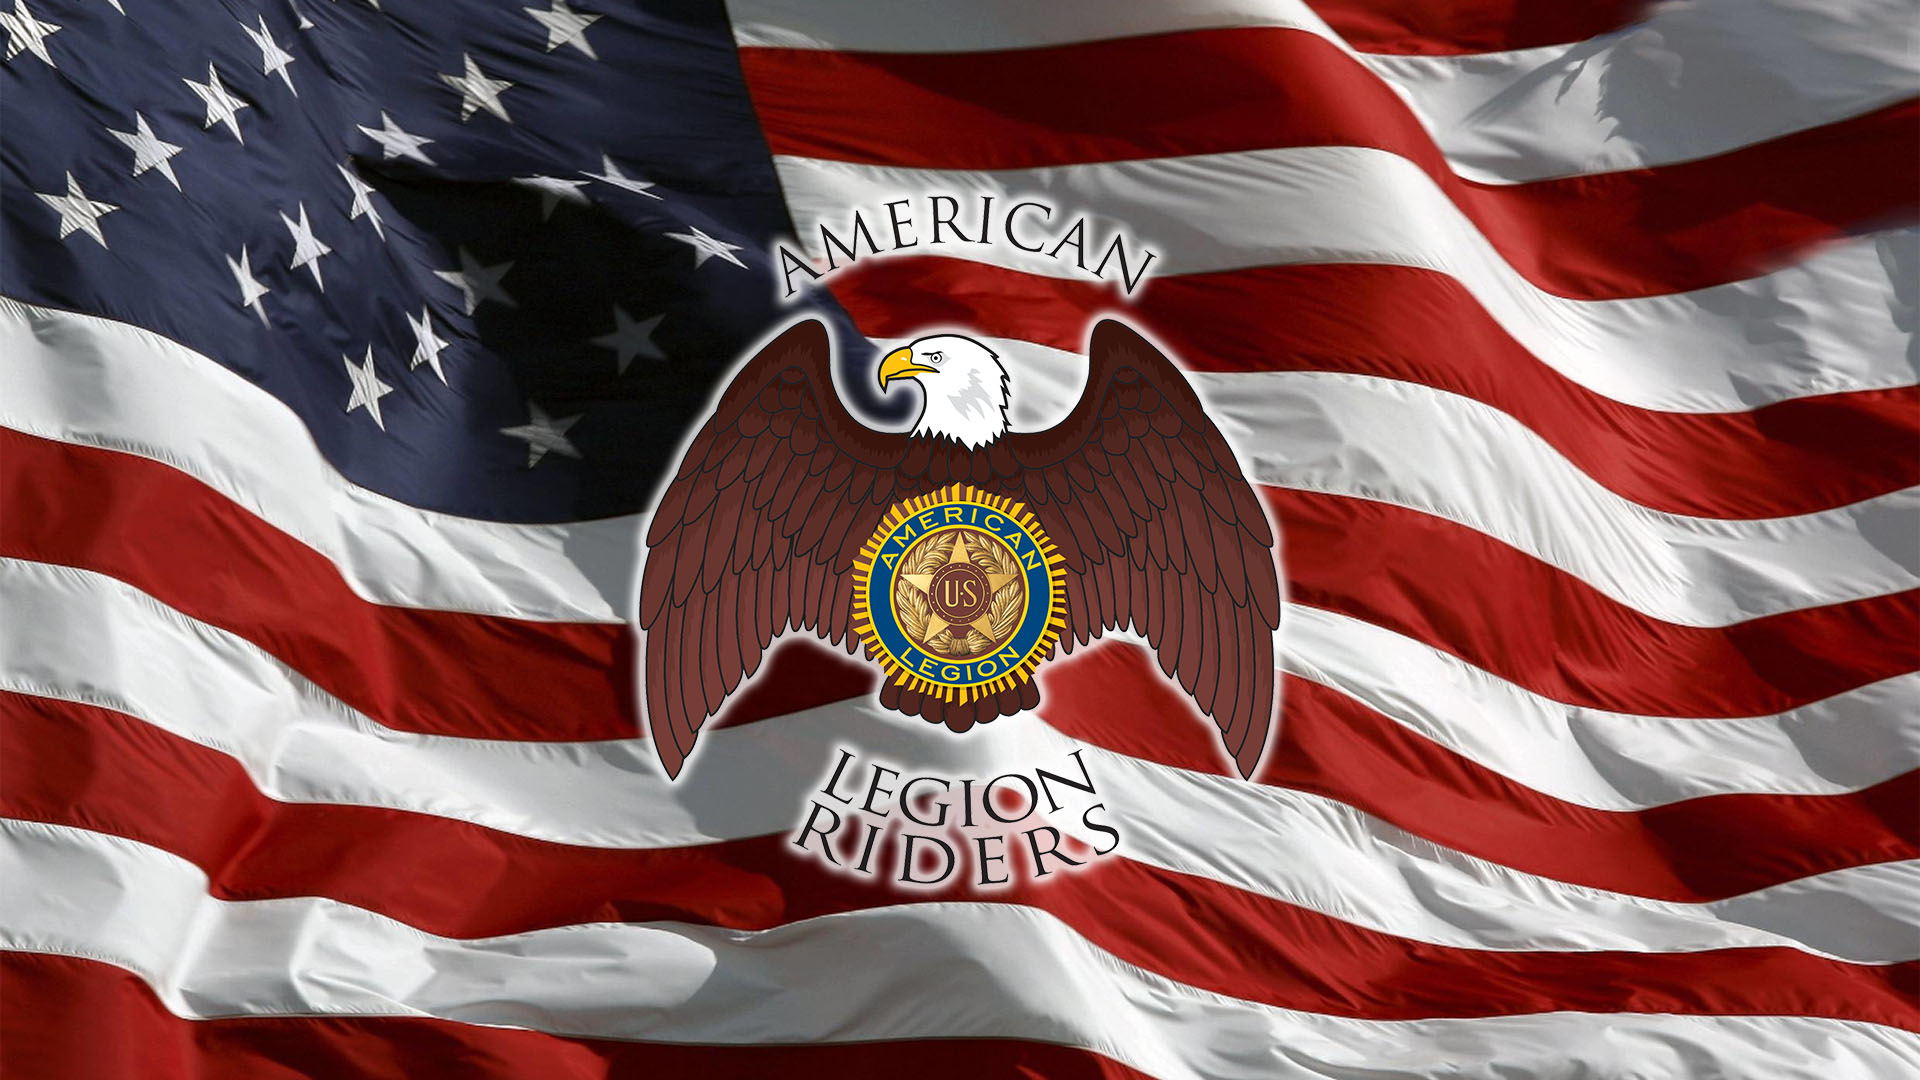 American Legion Post 127 Riders